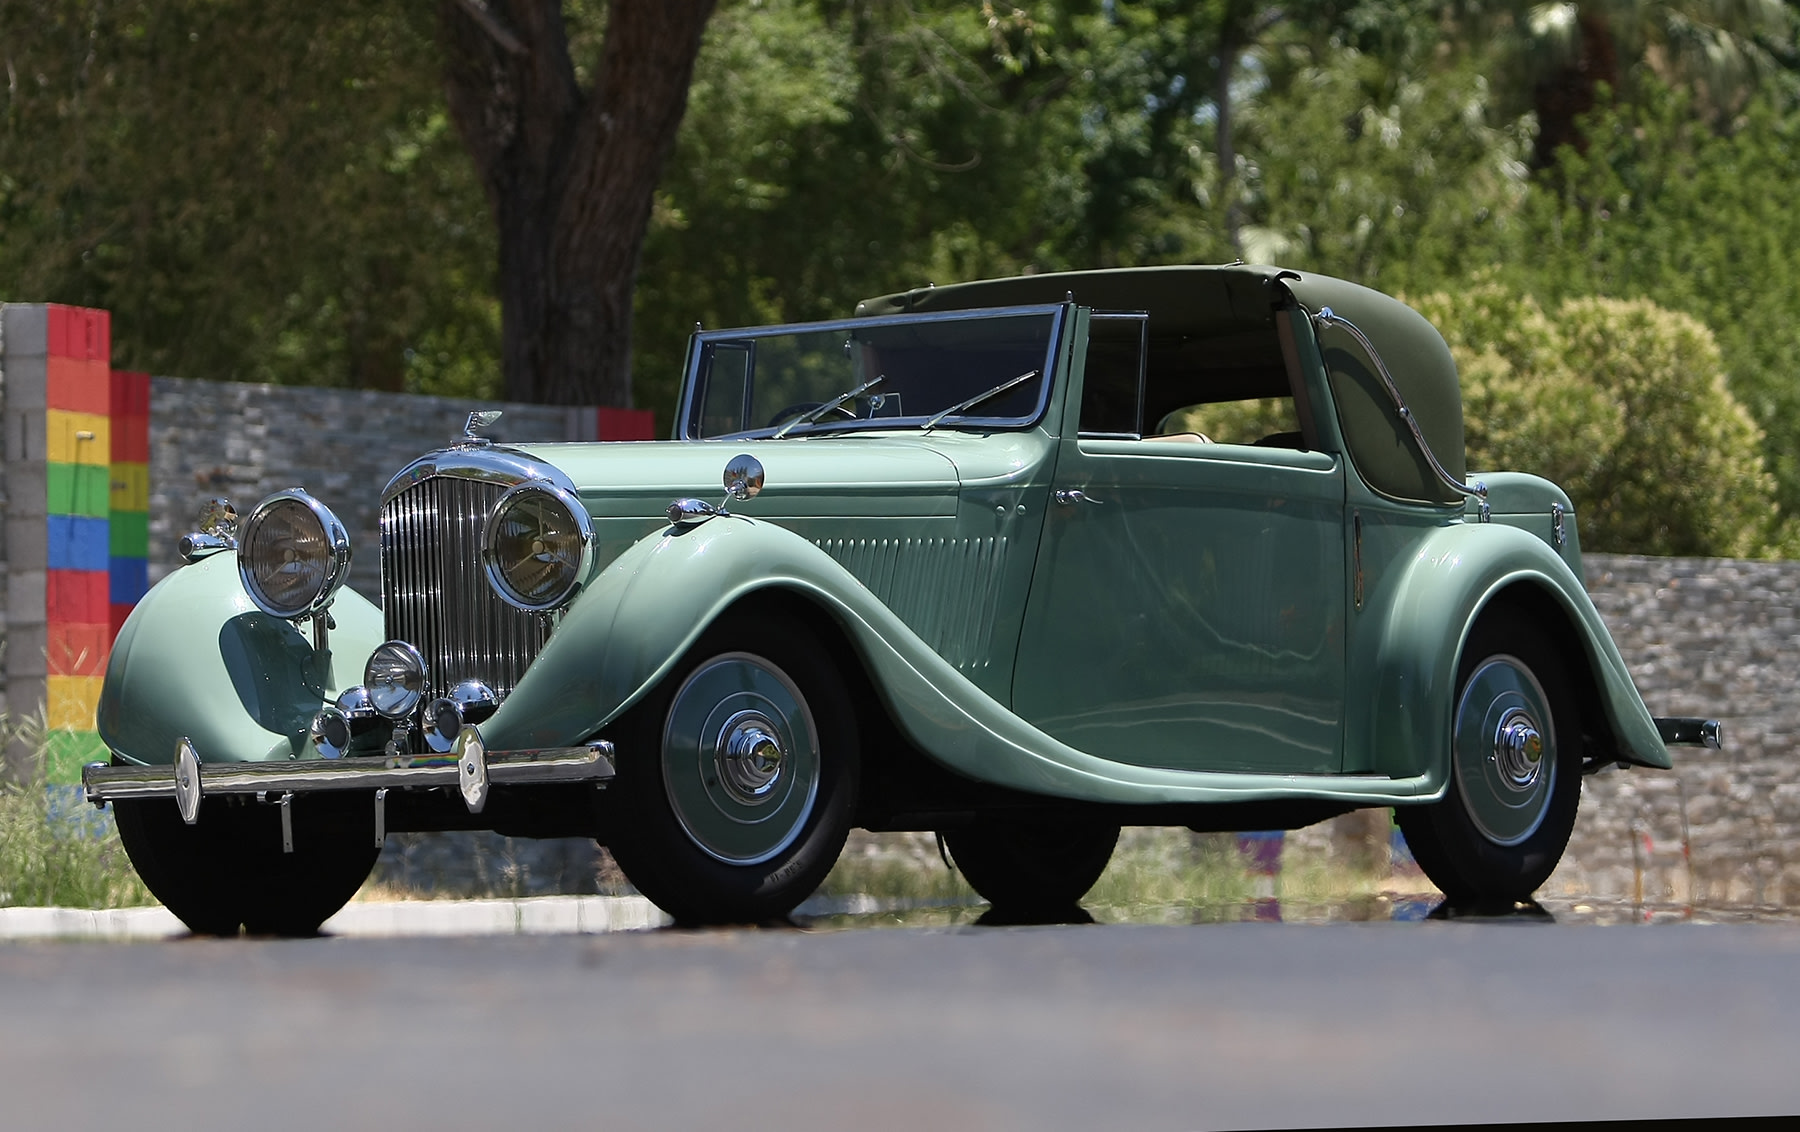 1936 Bentley 4 1/4-Litre Sedanca Coupe